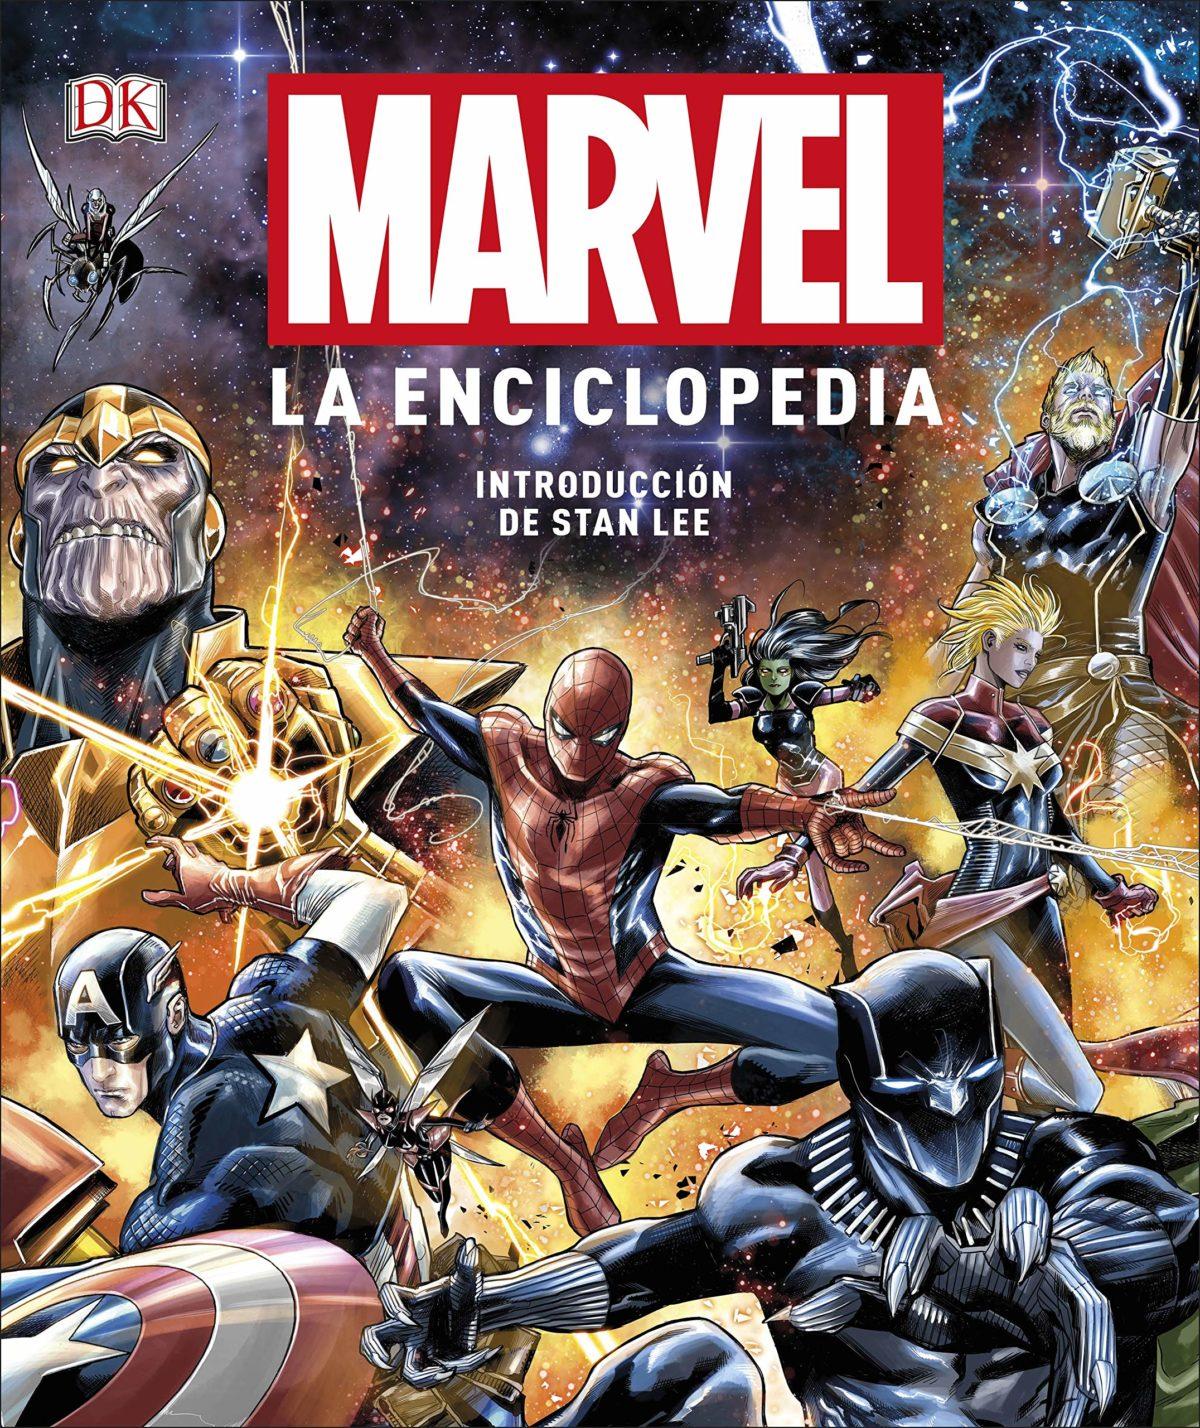 Marvel. La enciclopedia: Prólogo de Stan Lee (Español) Tapa dura